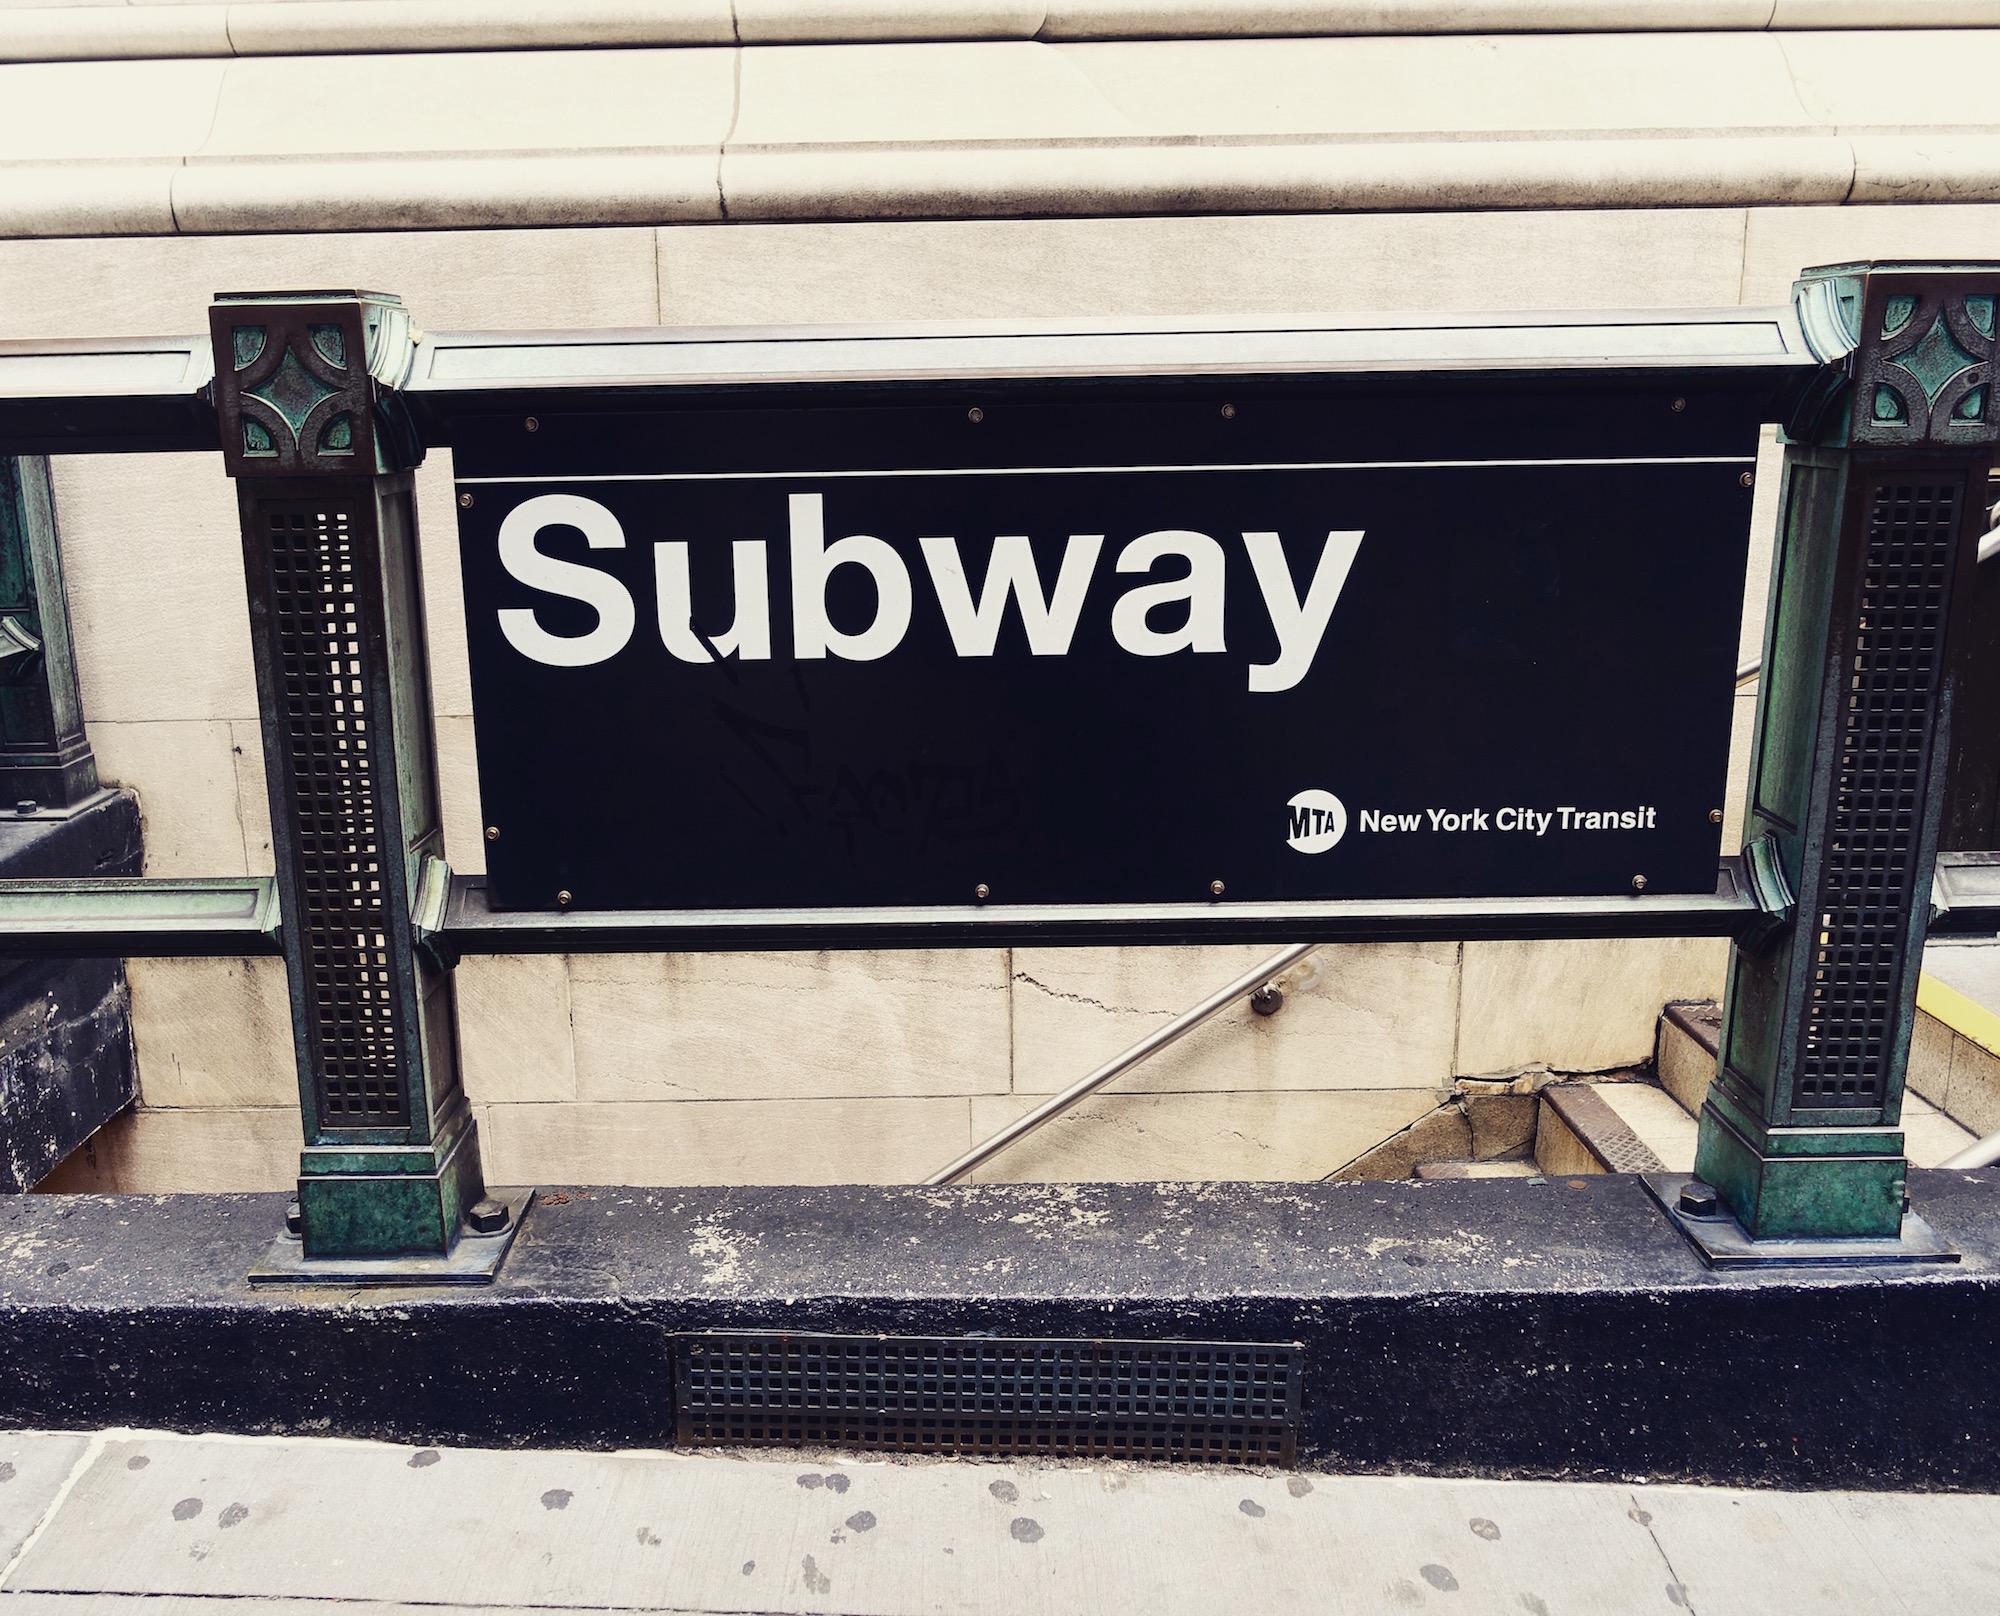 NYC Subway. Photo by Jeanie Lo.